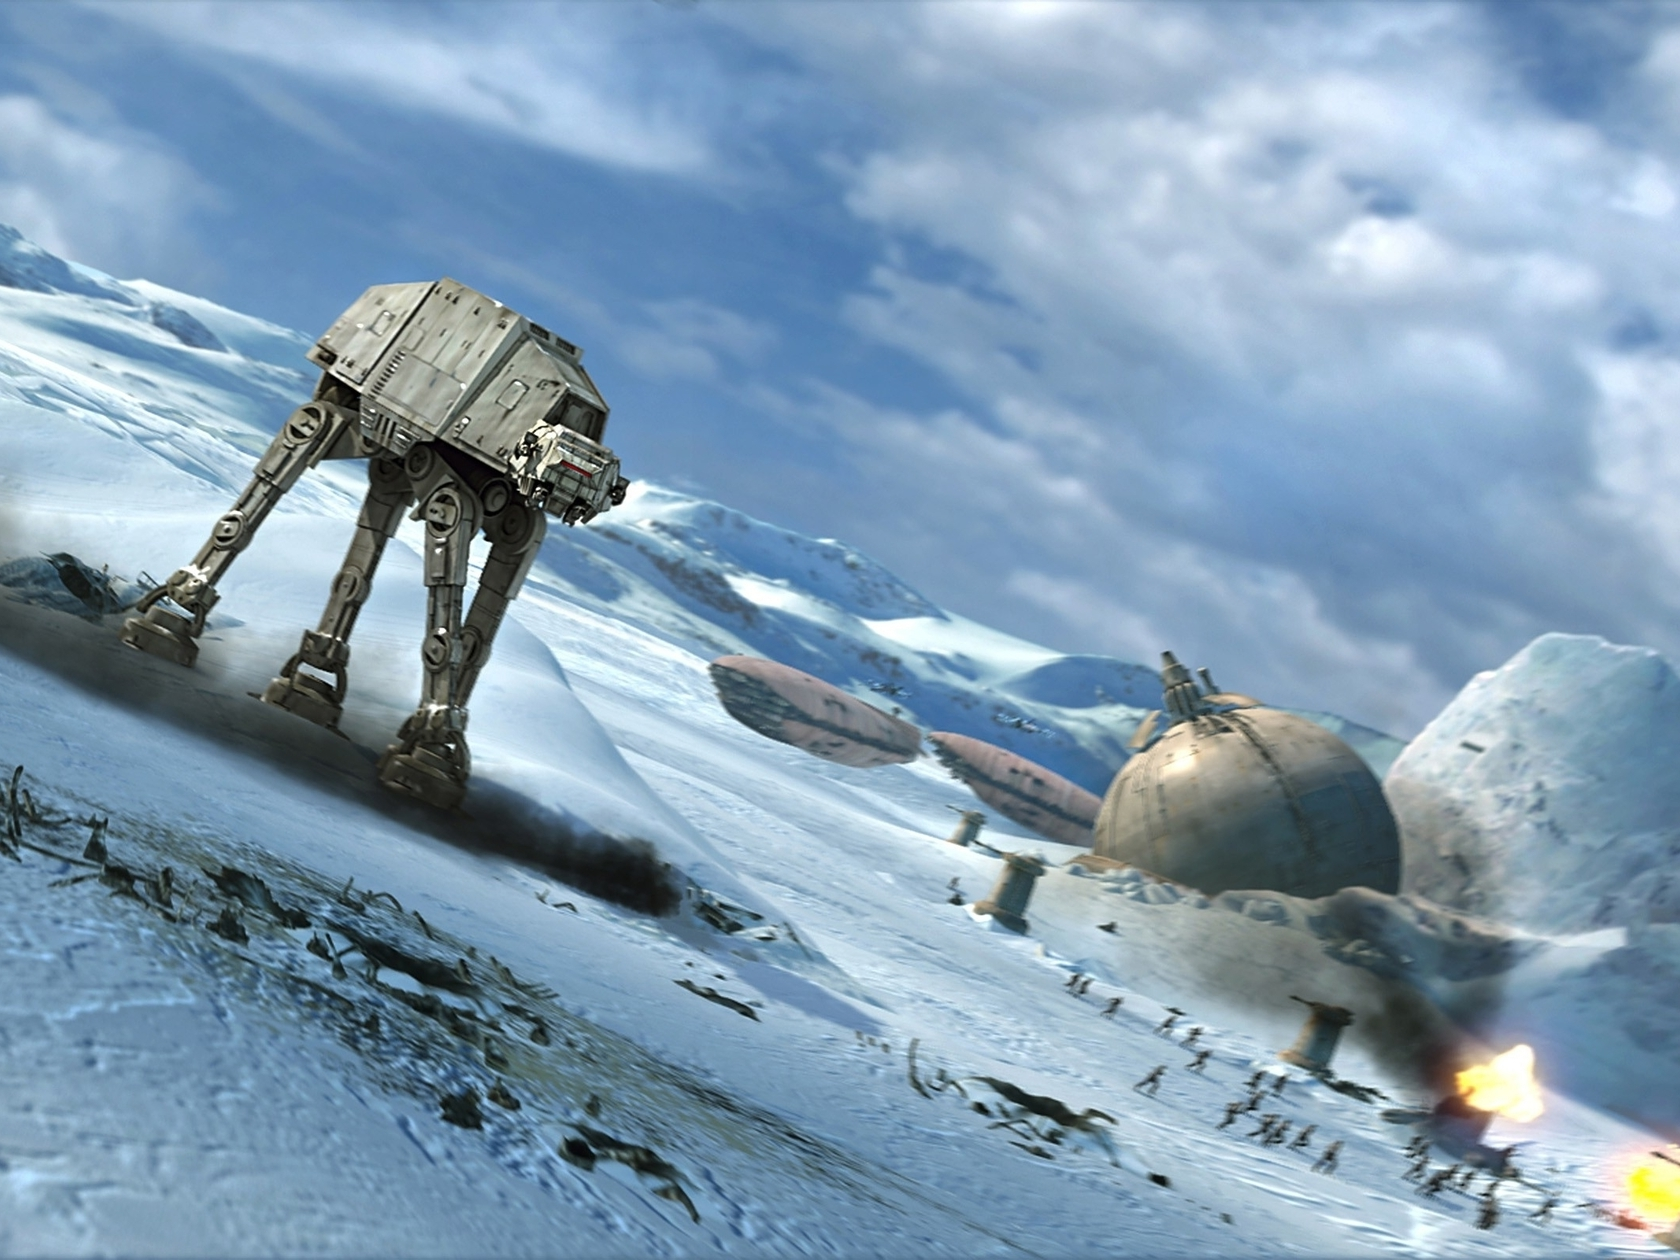 Star wars hoth battles atat (1680x1260)